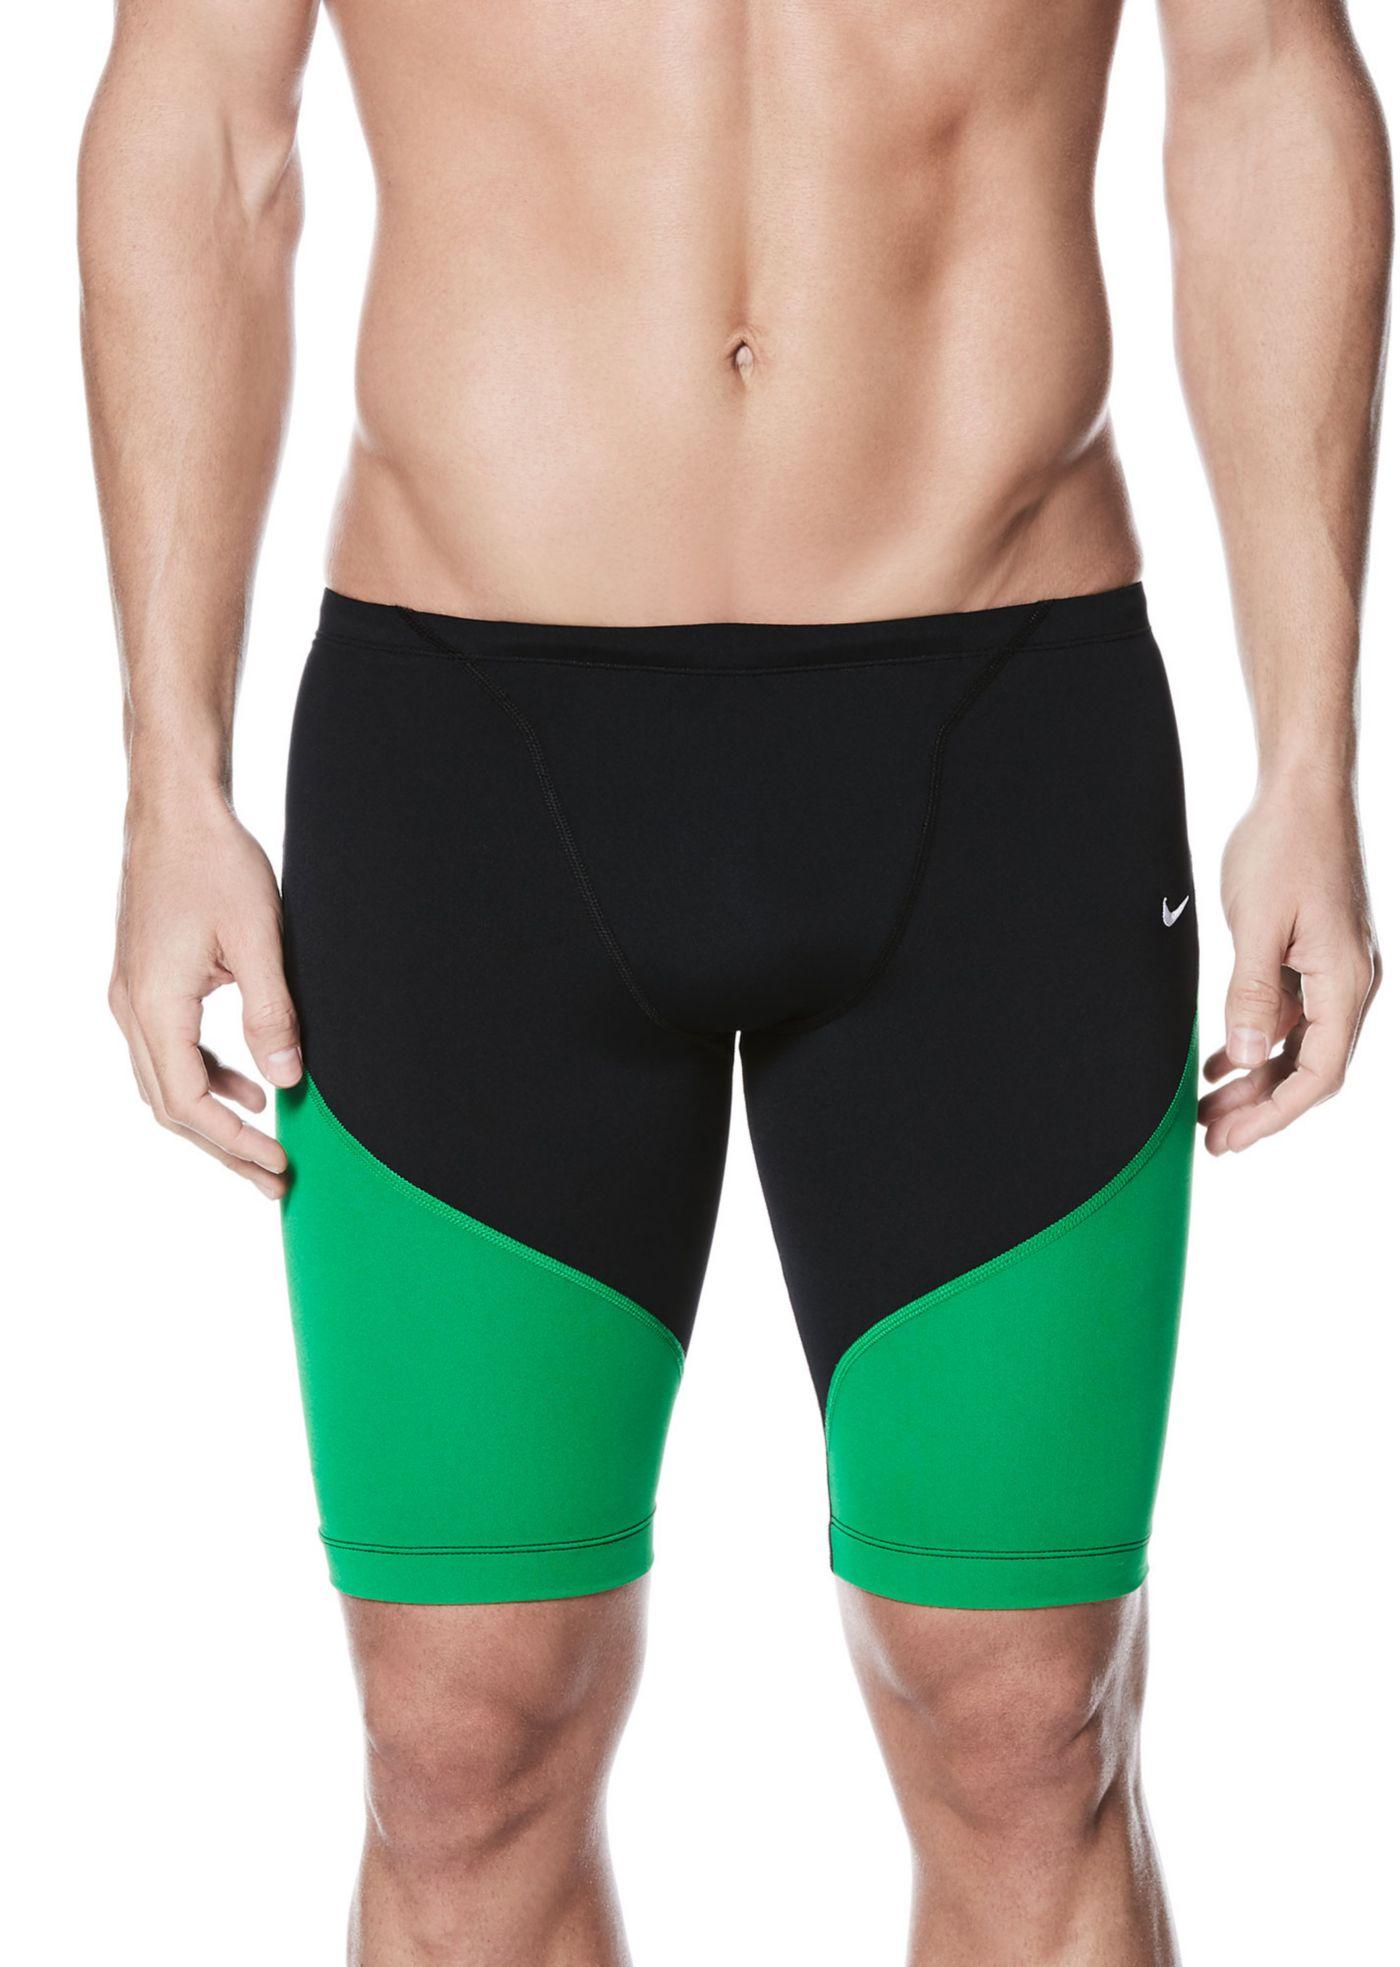 Nike Men's Color Surge Jammer